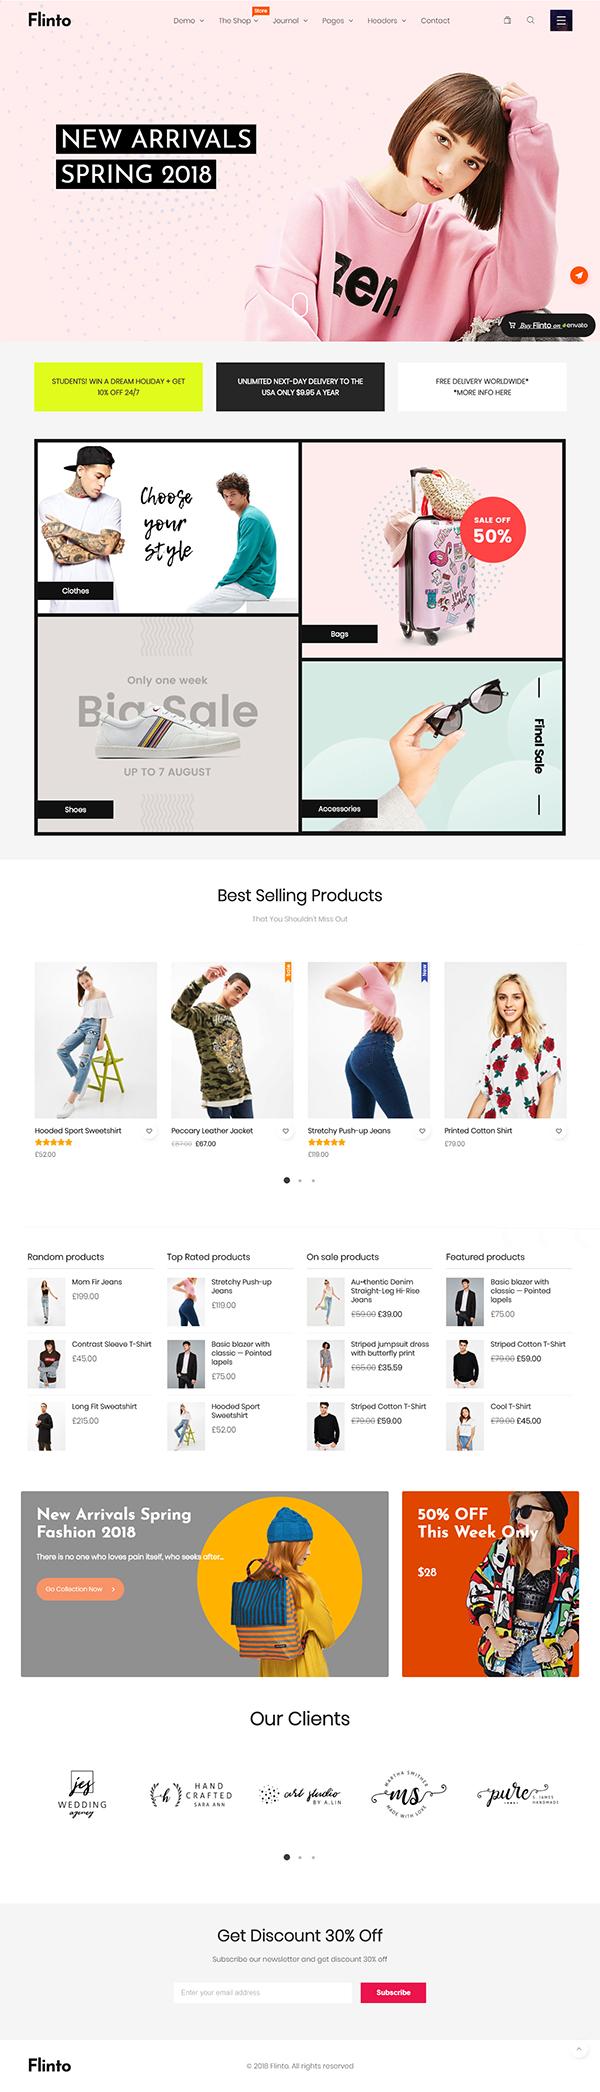 Flinto – Modern and Minimal eCommerce WordPress Theme